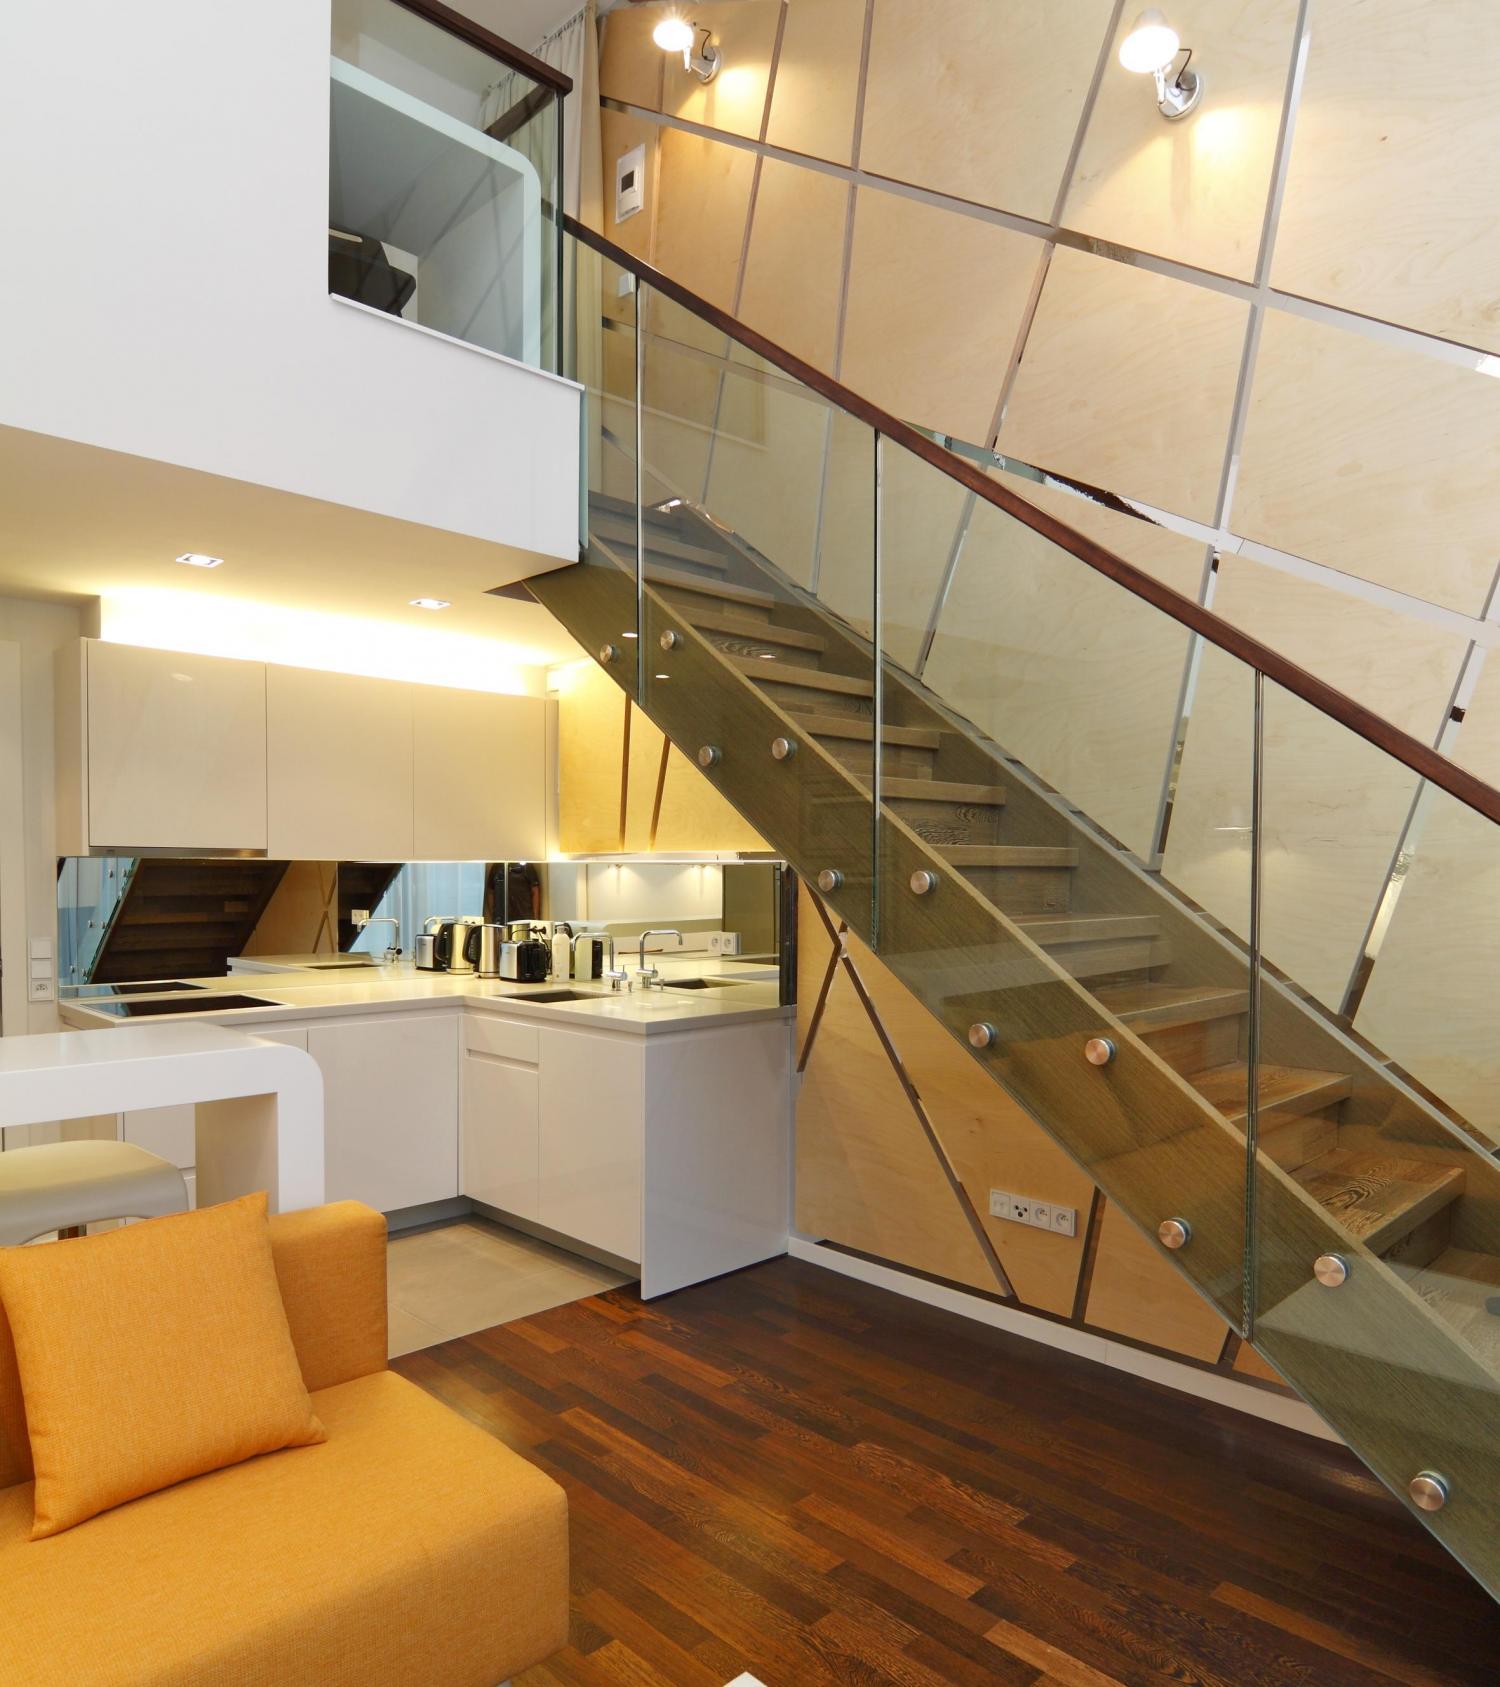 Mini appartement mit galerie eurovea bratislava slowakei - Mini appartement ...